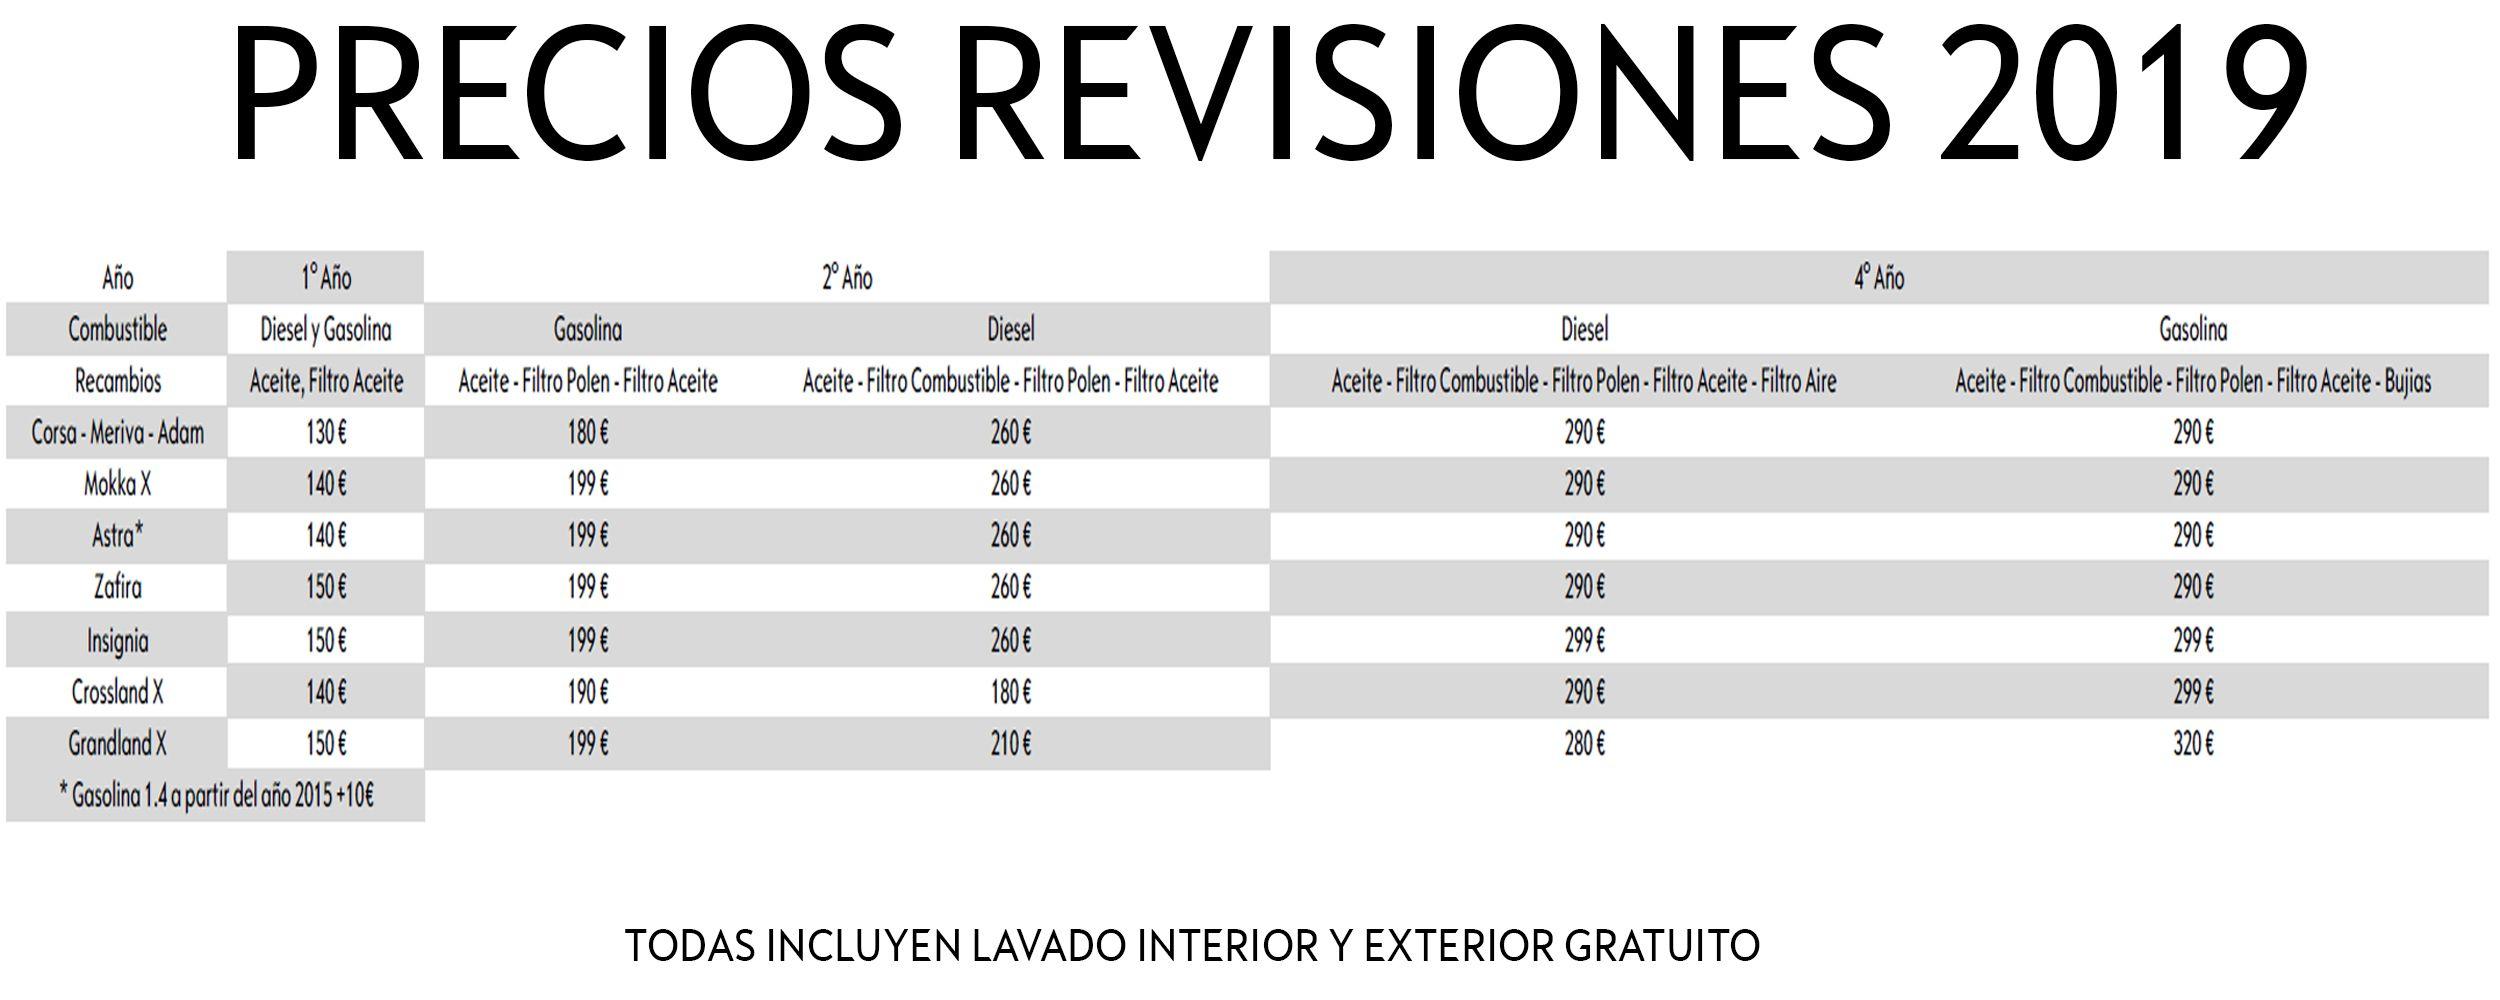 Ofertas Revisiones 2019